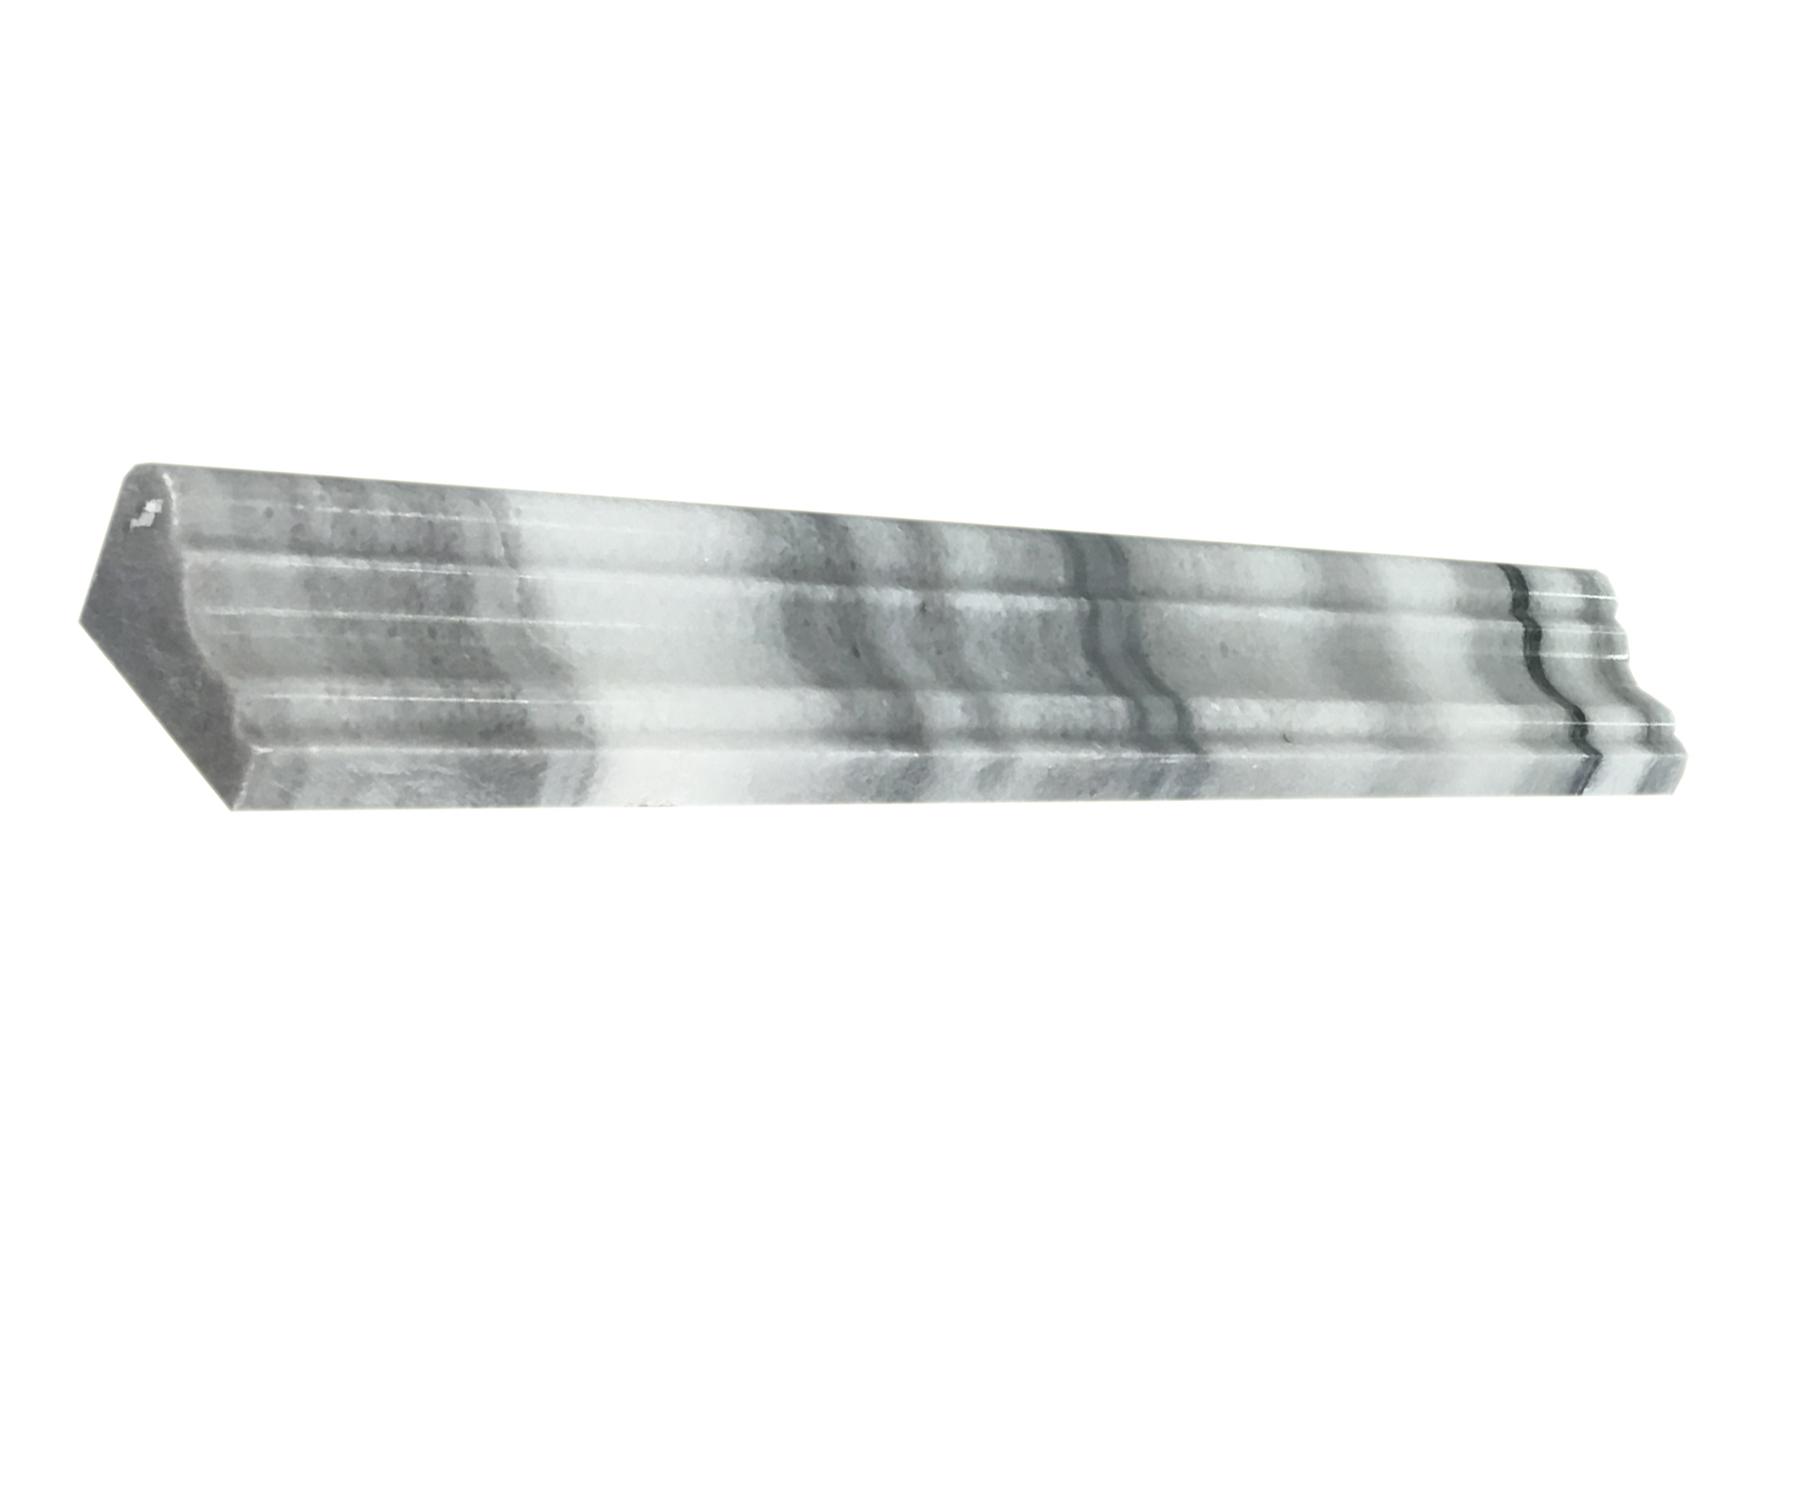 "Equator Crown Chair-Rail - 2"" x 12"" Image"